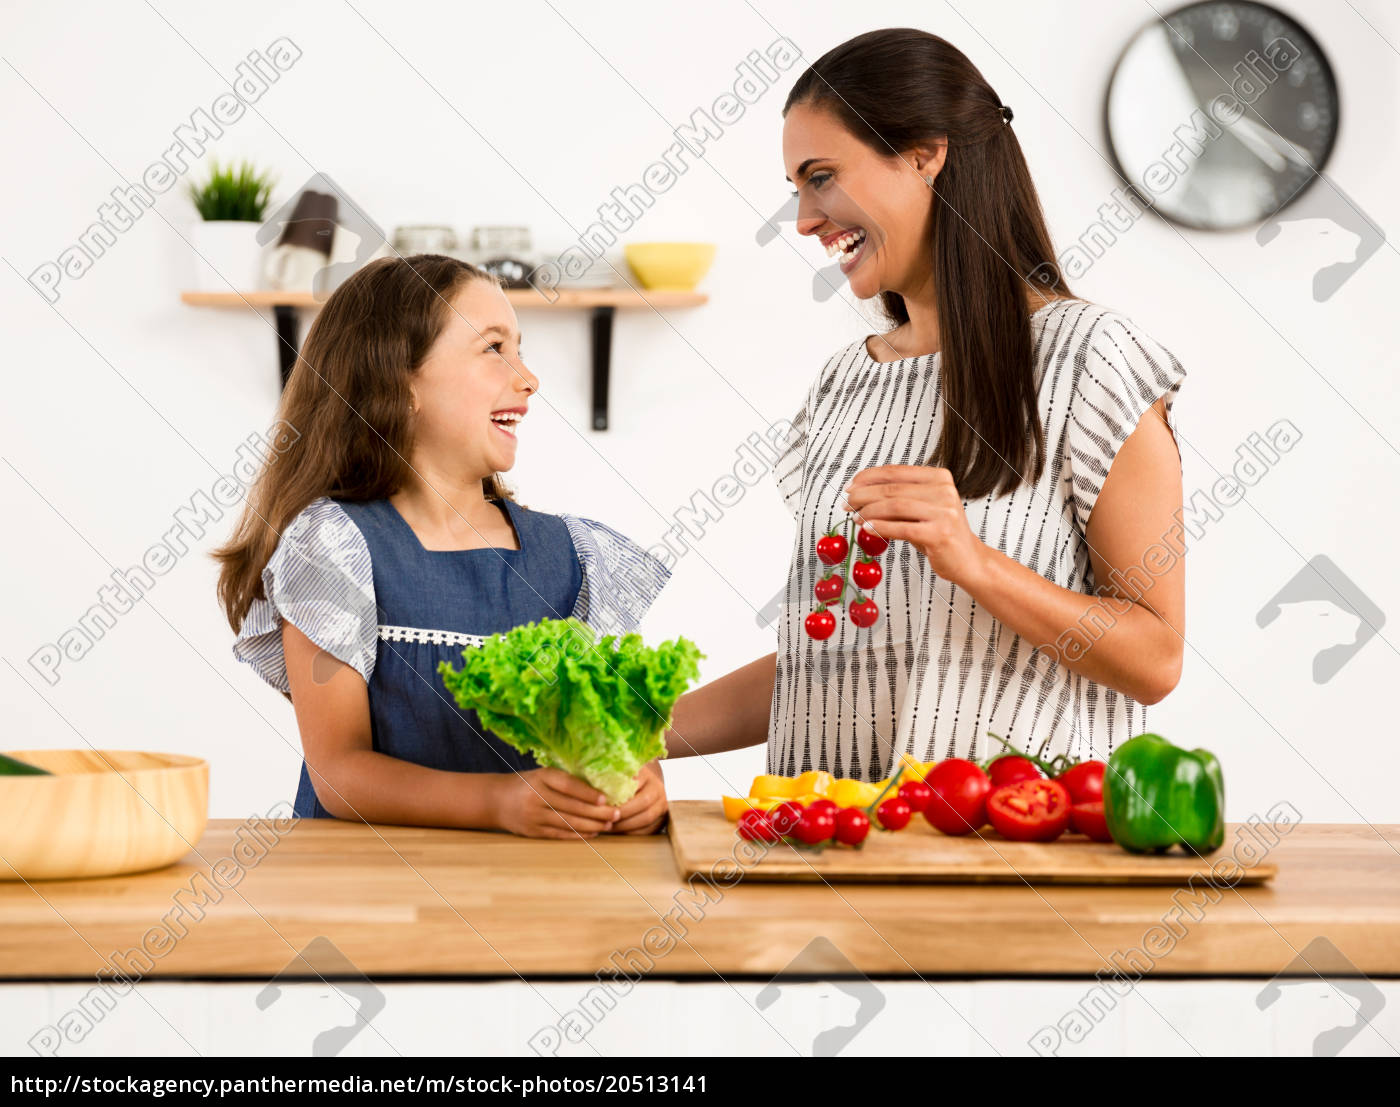 having, fun, in, the, kitchen - 20513141